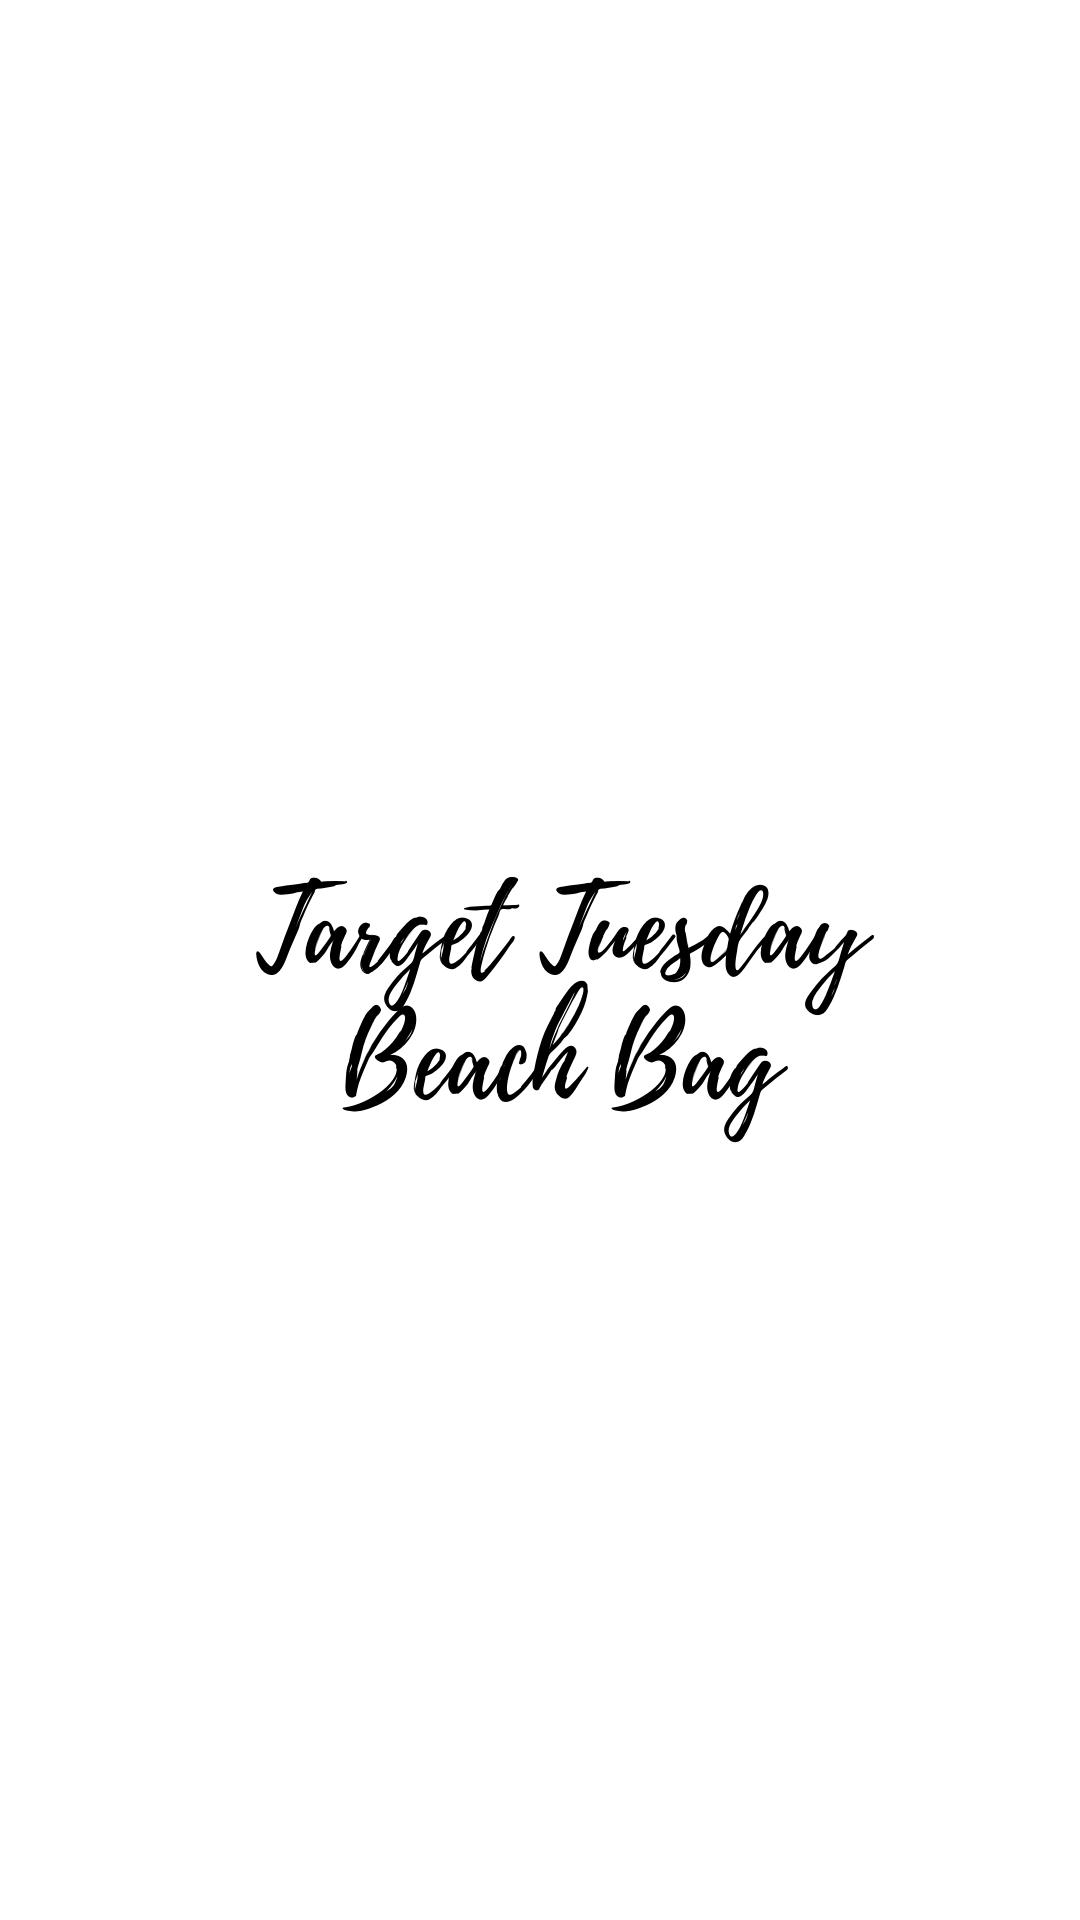 Target Tuesday: Beach Bag!